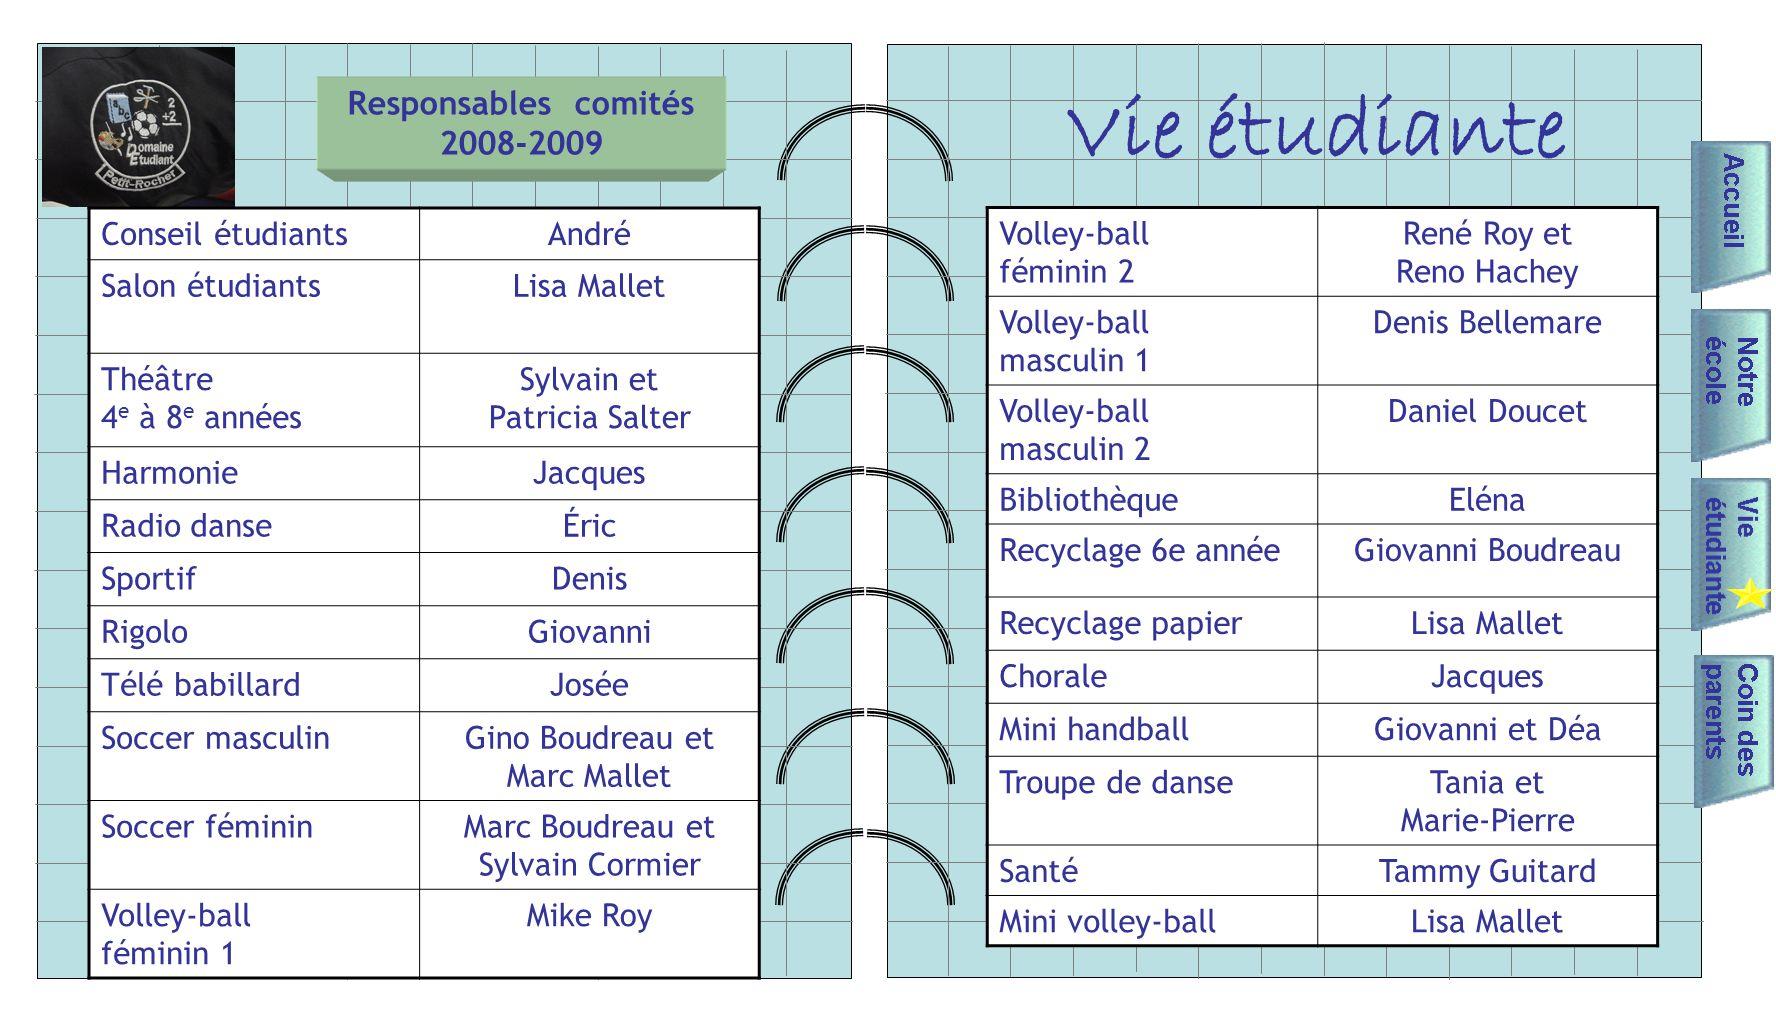 Responsables comités 2008-2009